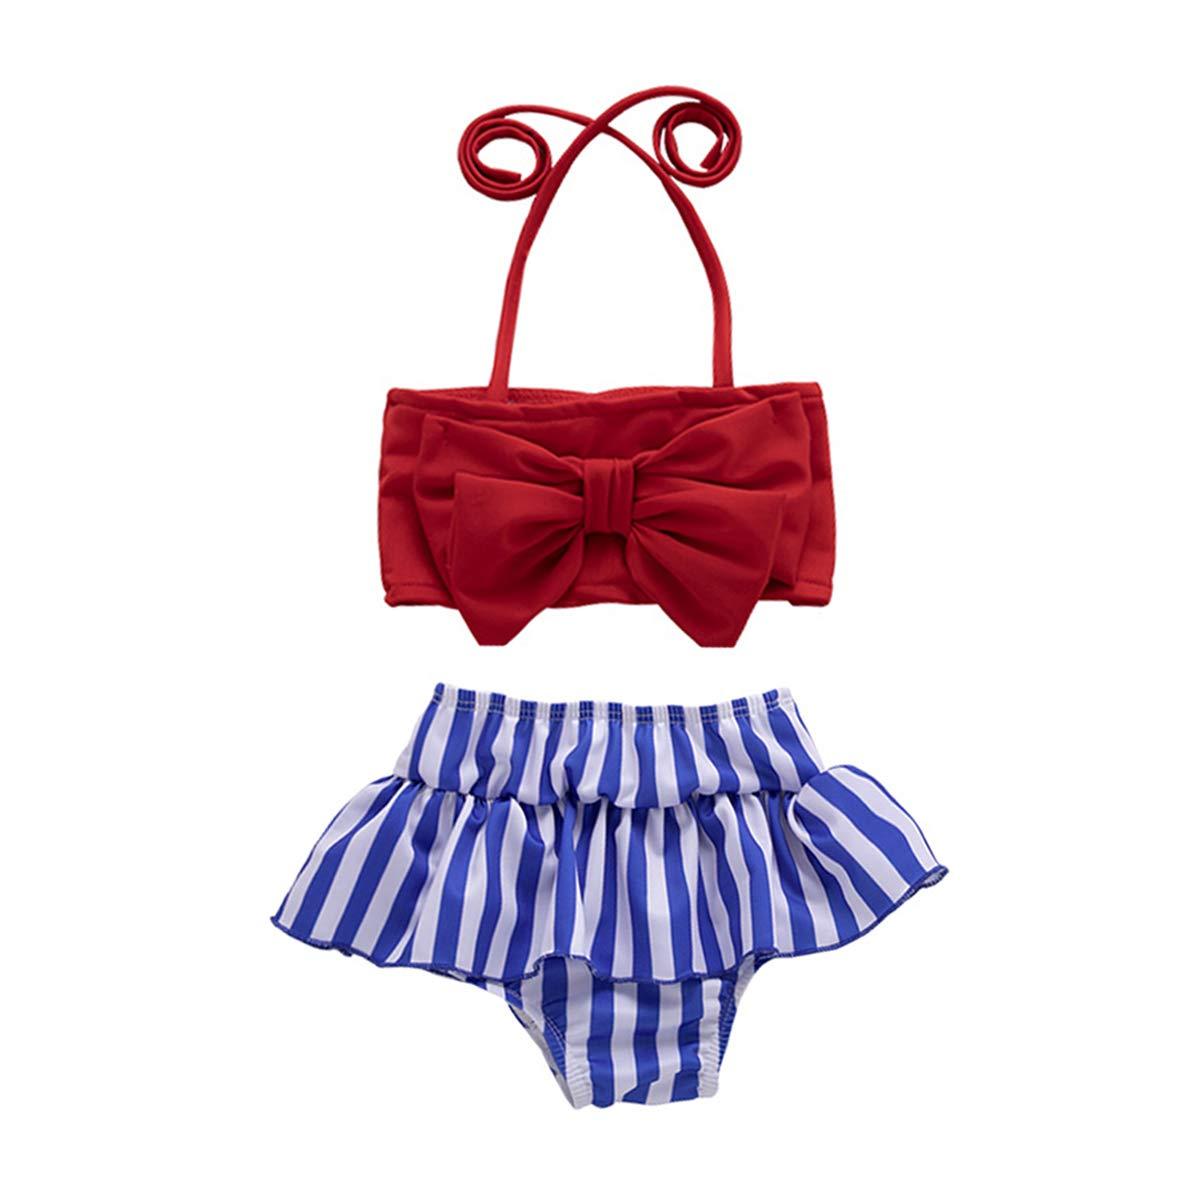 JEELLIGULAR Baby Girl Babies Swimwear Bowknot Stripe Swimsuit Bathing Suit Bikini Set Outfits Summer